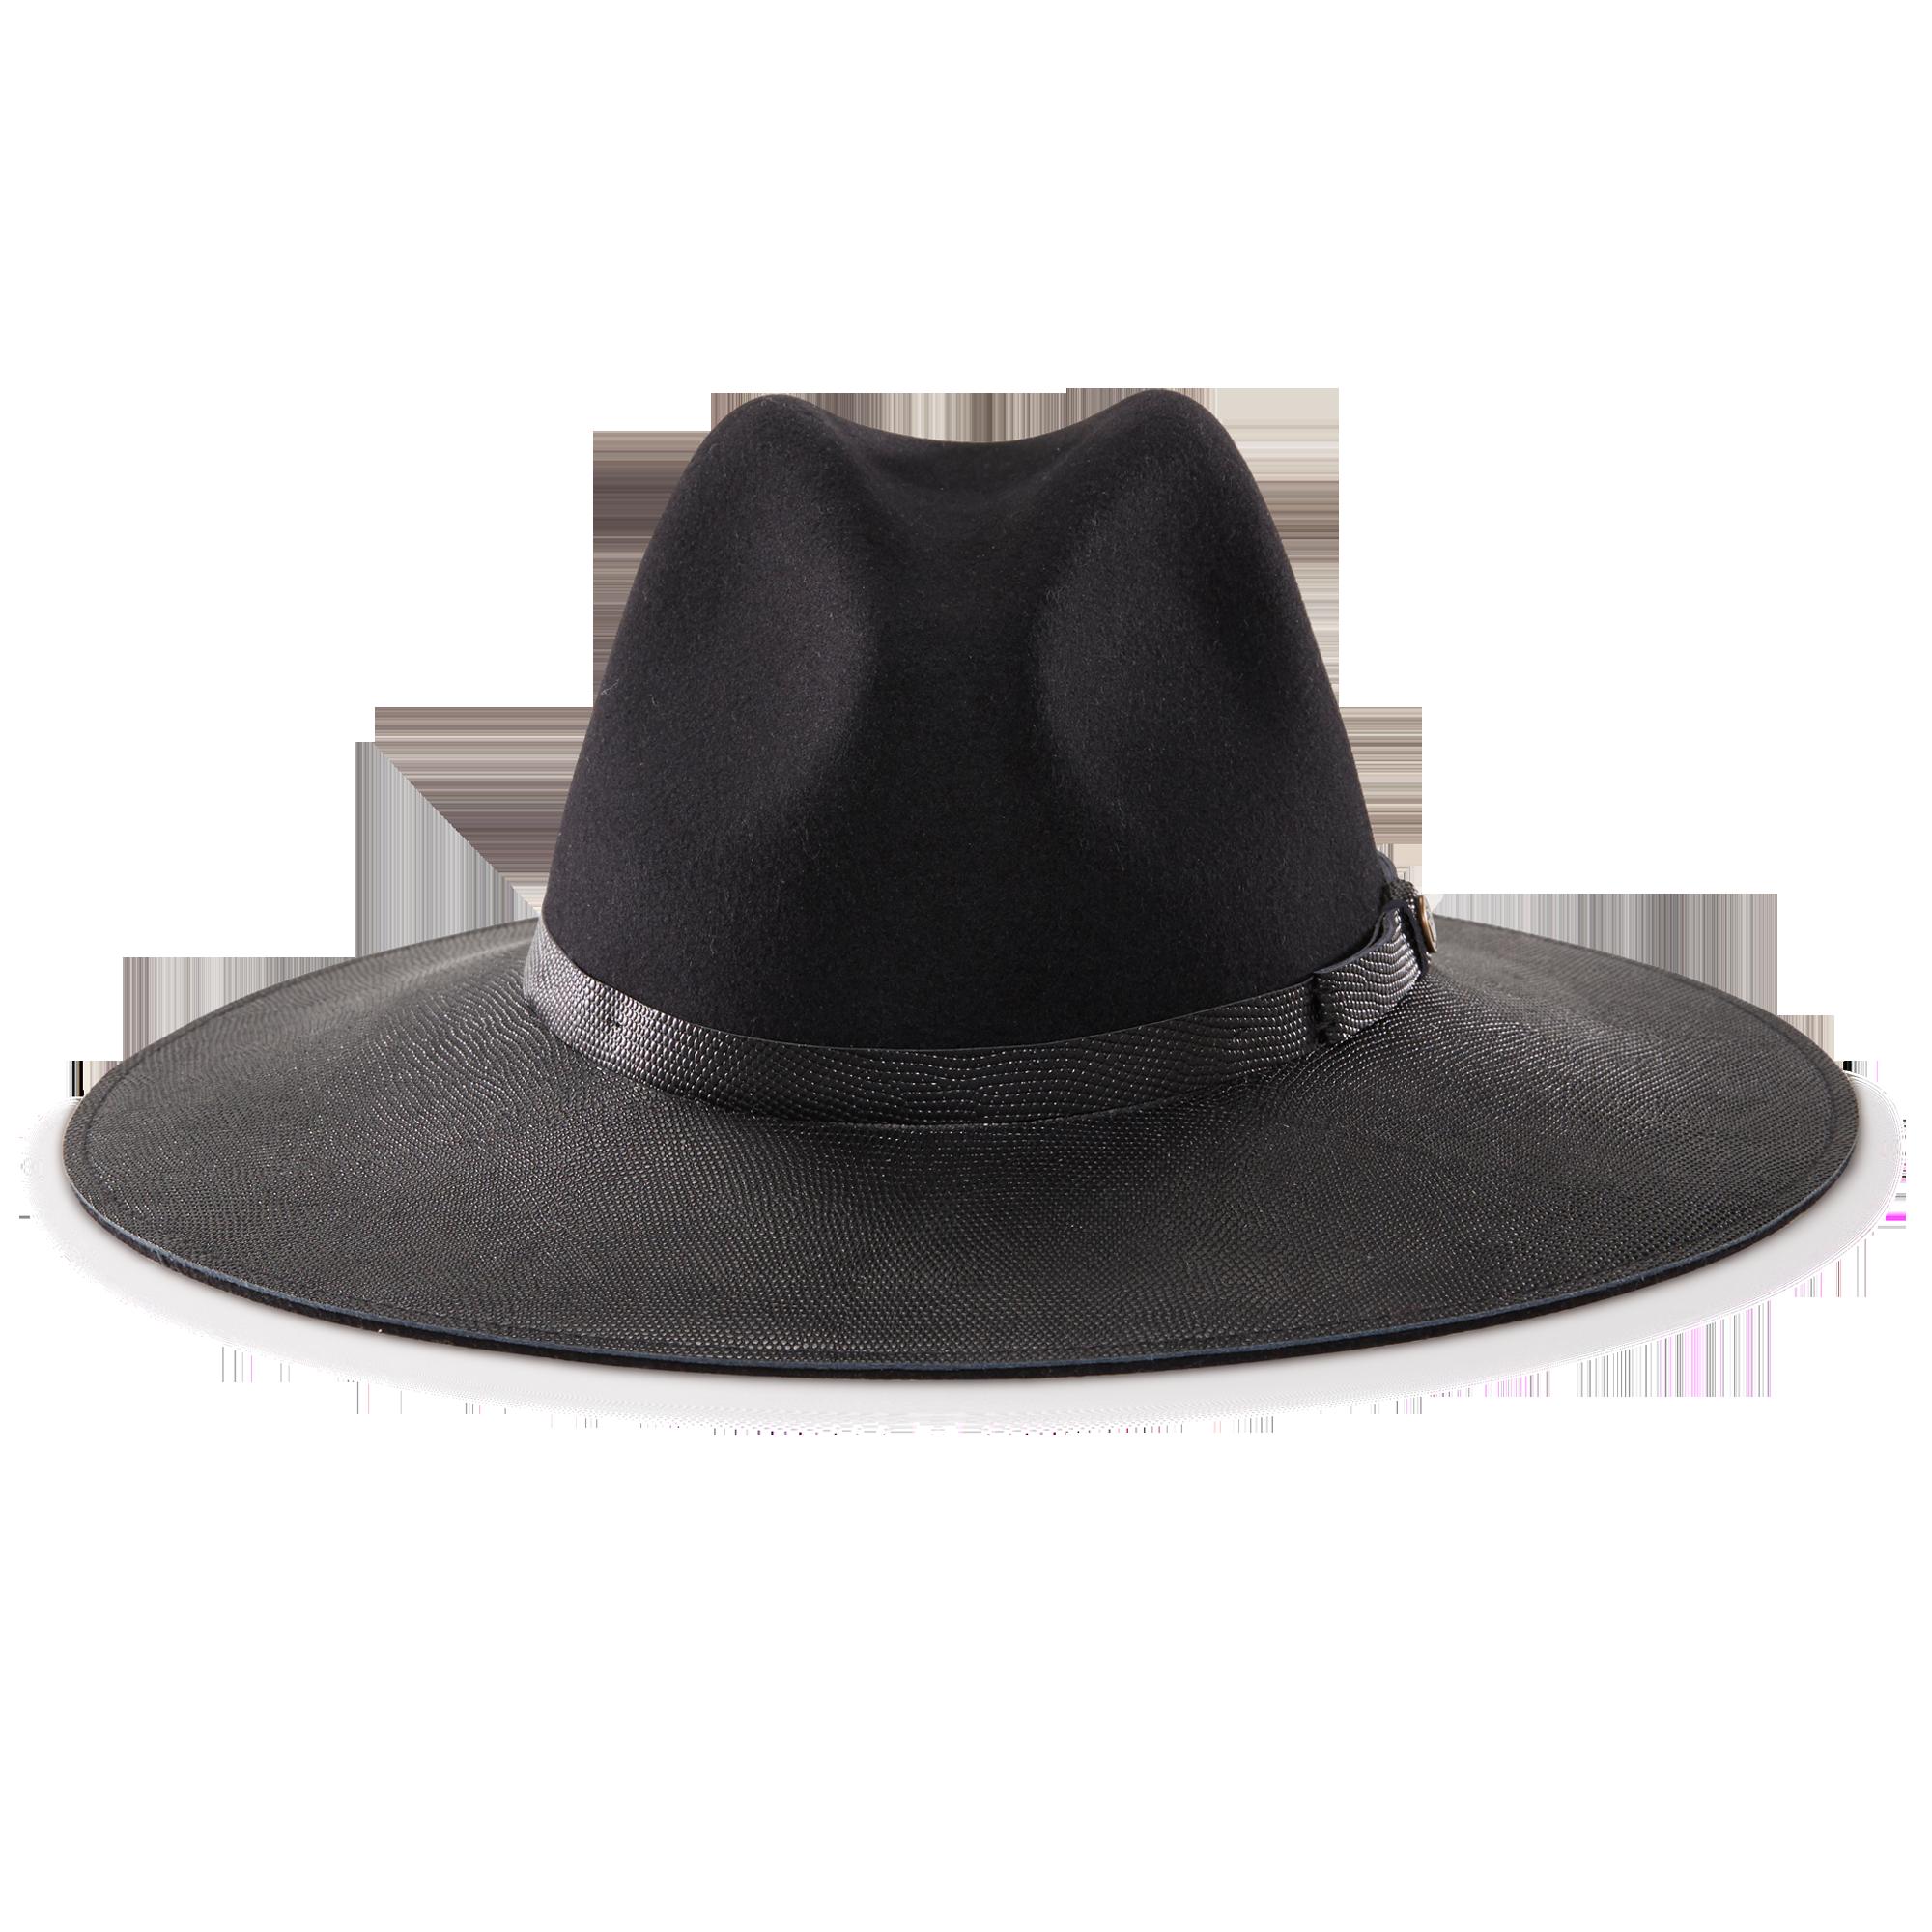 b77cbf2a0f853 Arctic Blackfelt Wide Brim Fedora hat front view